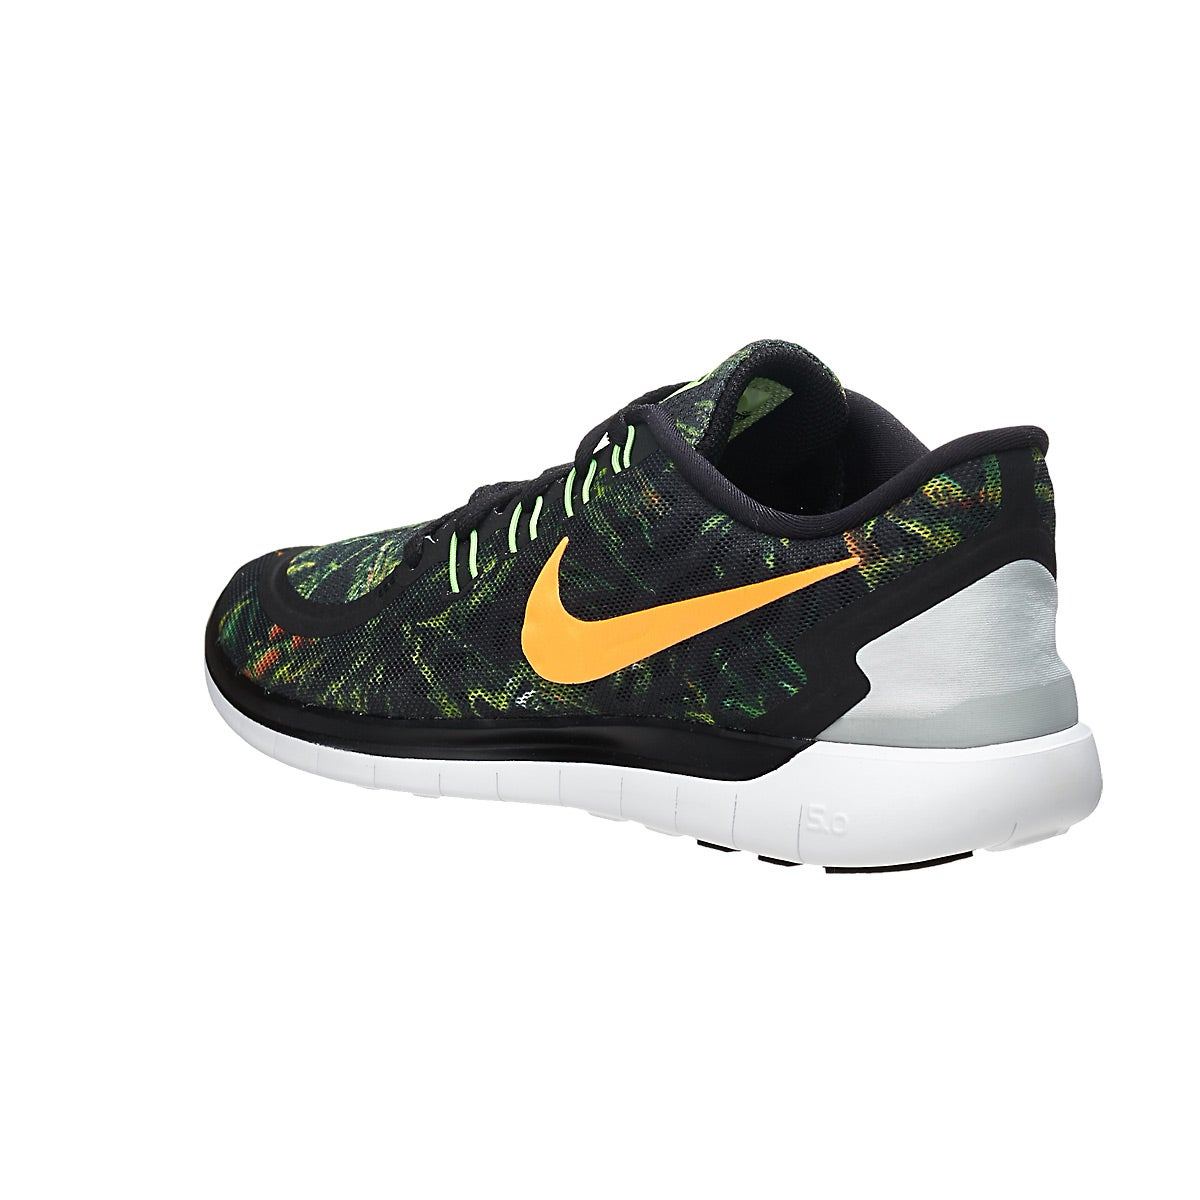 Nike Free 5.0 360 Vue